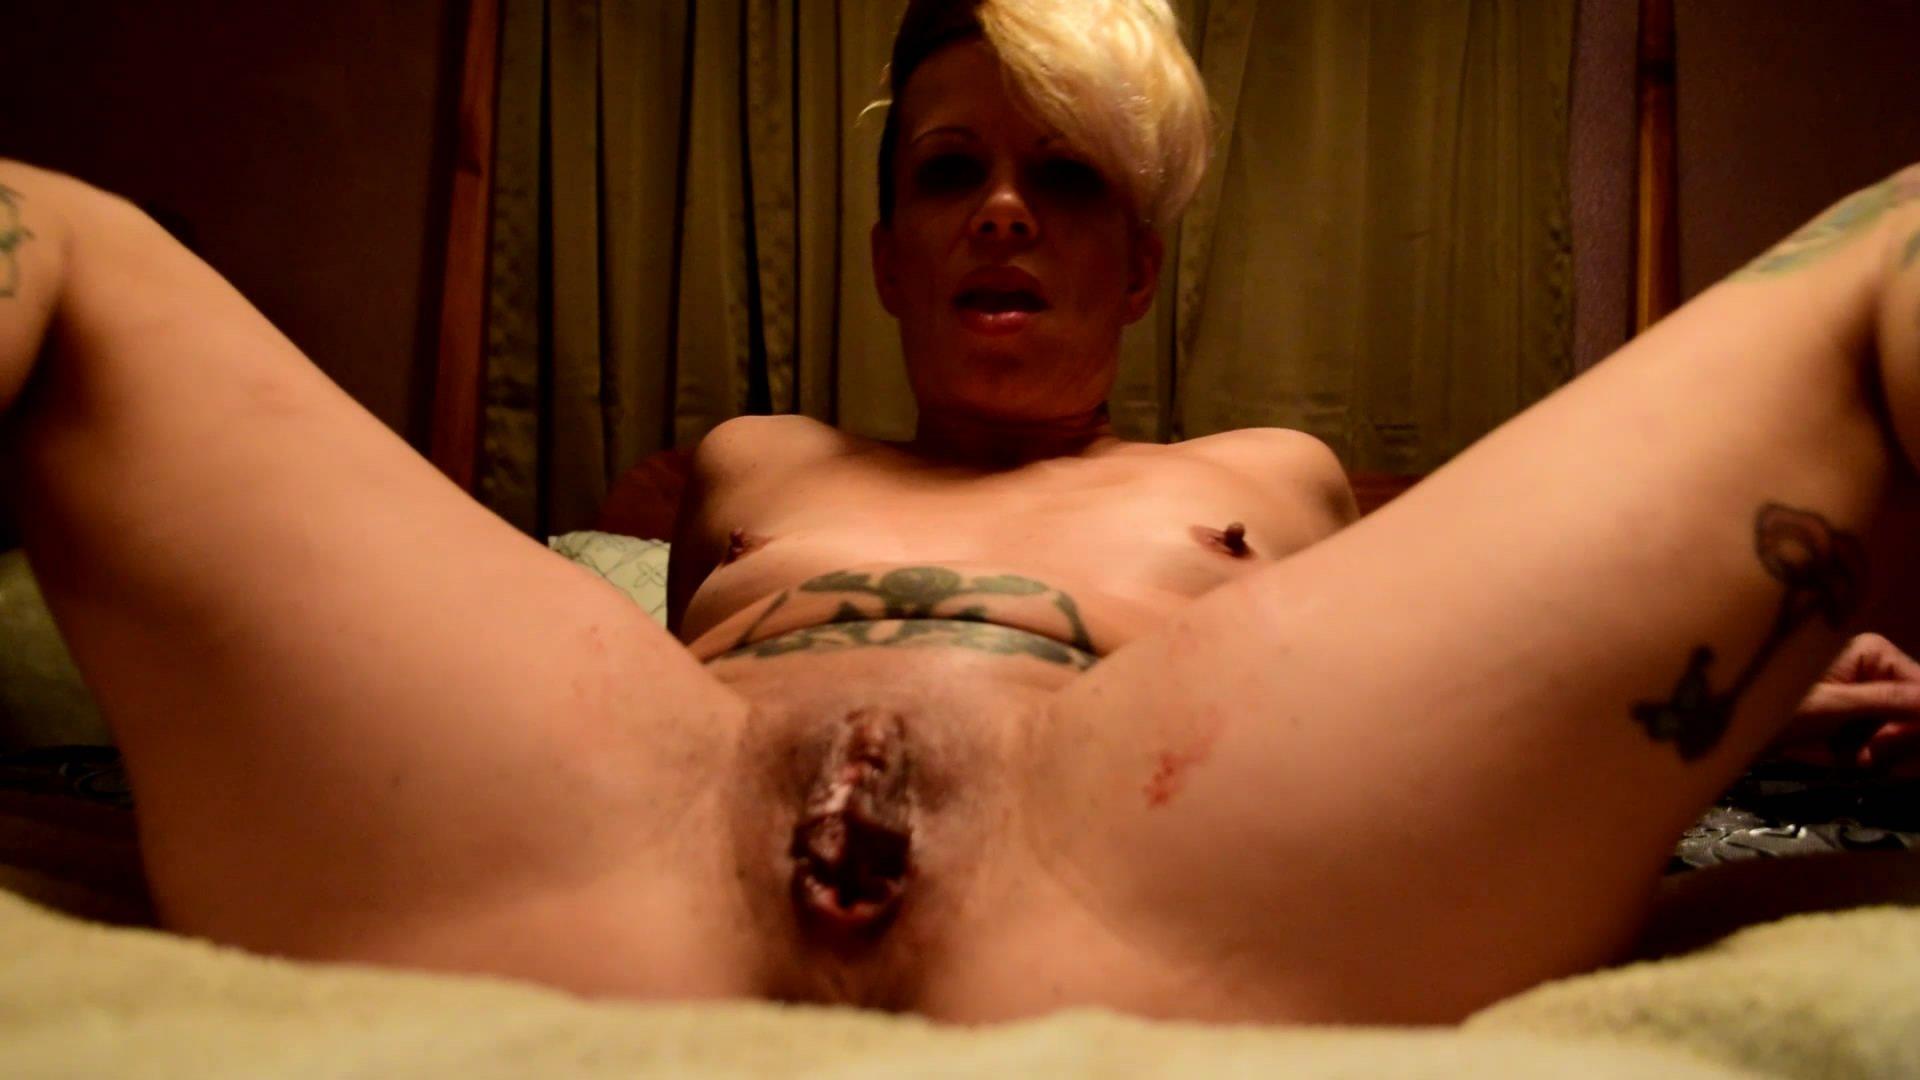 Horny Pussy Fuck starring in video Juicy_Julia ($7.99 ScatShop) – Period Play